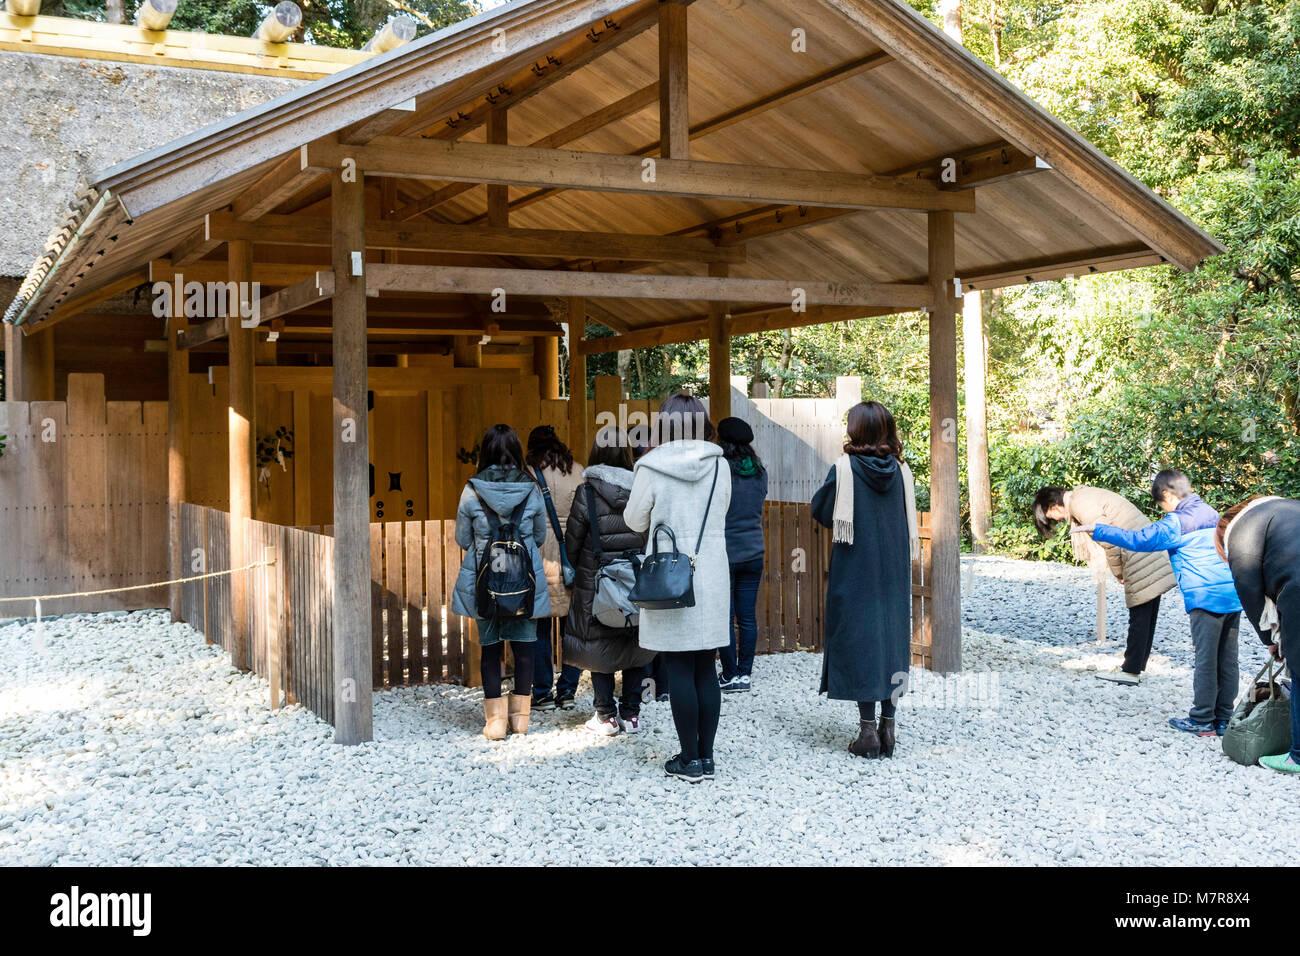 Japan, Ise, Ise-jingu Geku, Outer Shrine. People praying at small wooden shinden shrine building. Shinmei zukuri. - Stock Image